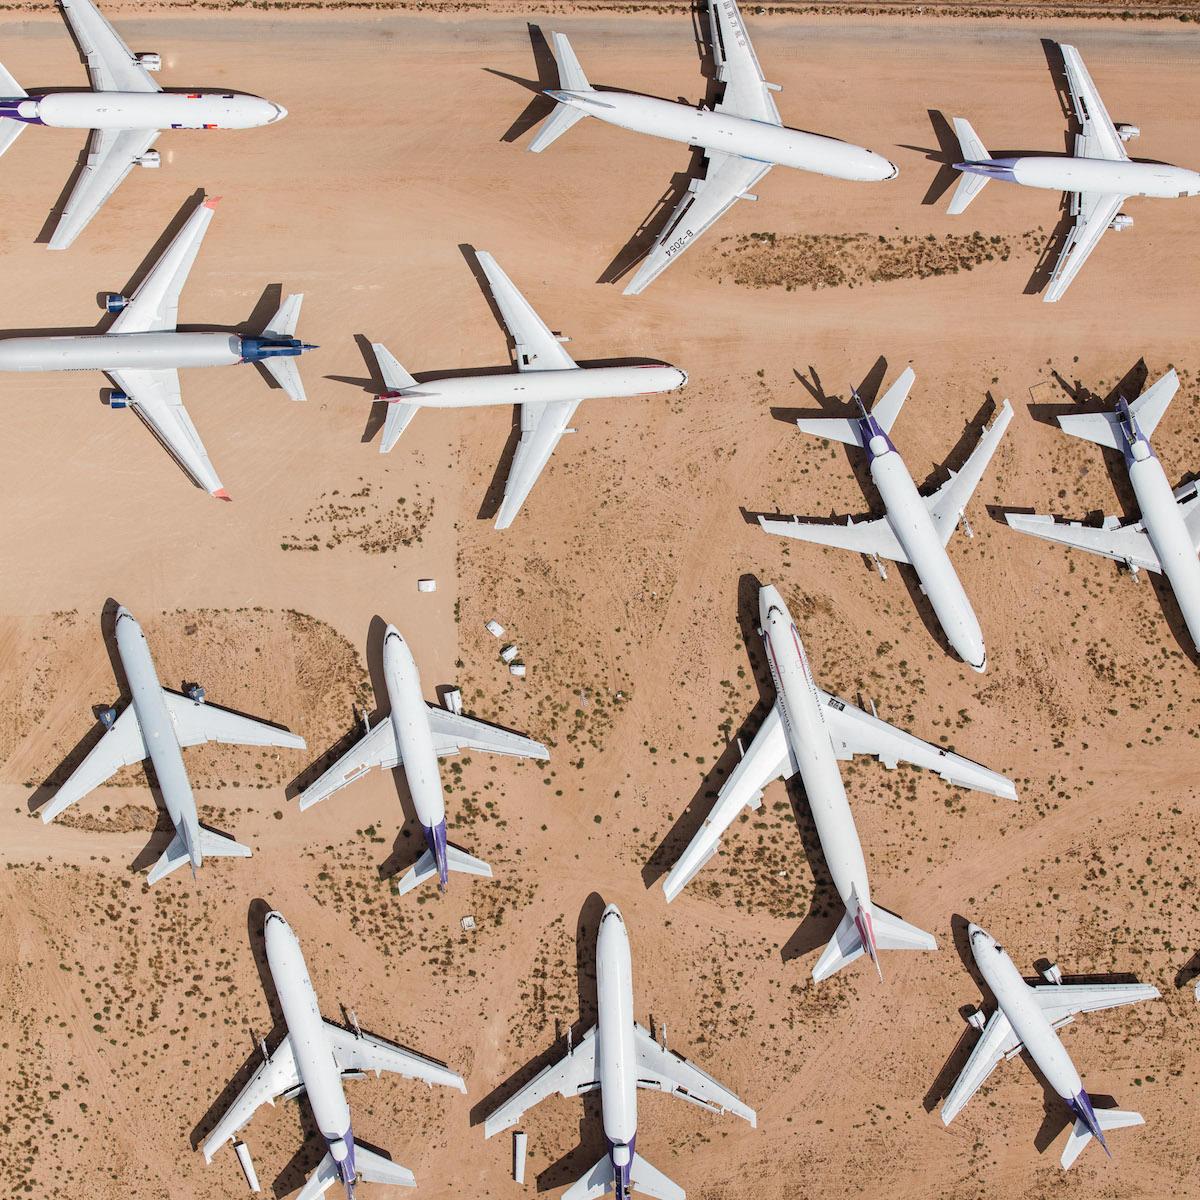 Aerial Aviation Photos - Mike Kelley